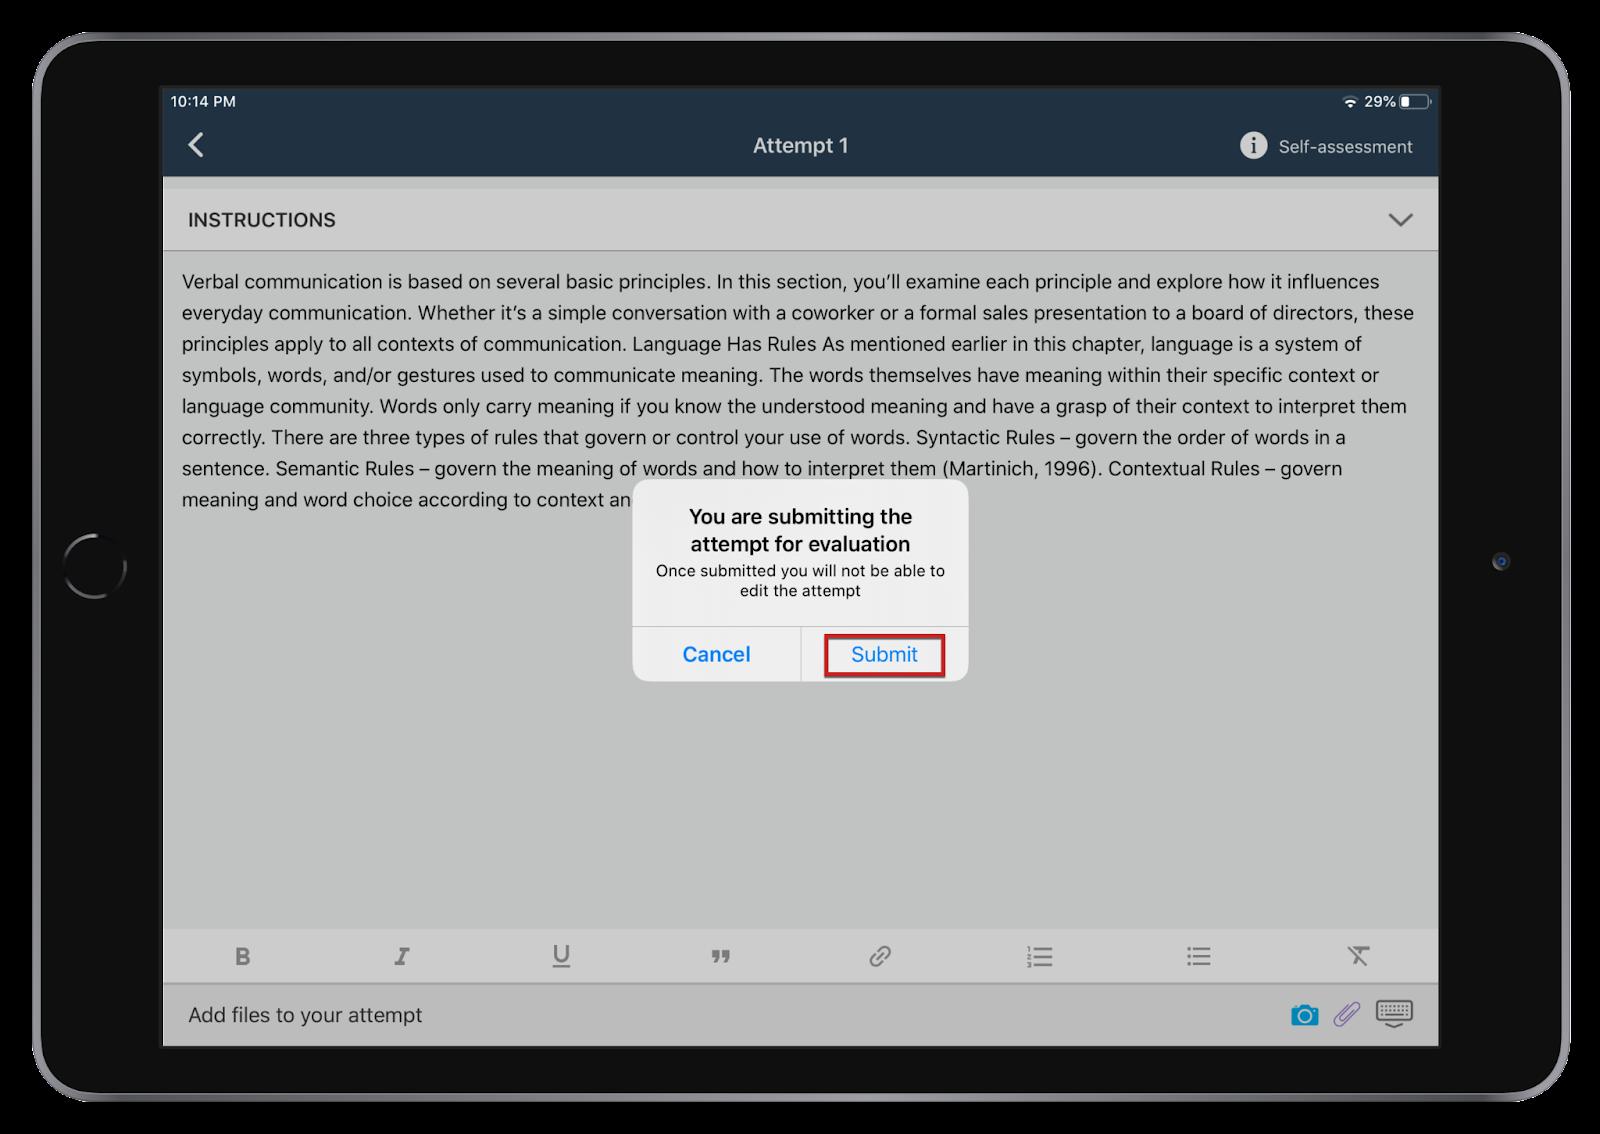 slef-assessment on teamie mobile apps